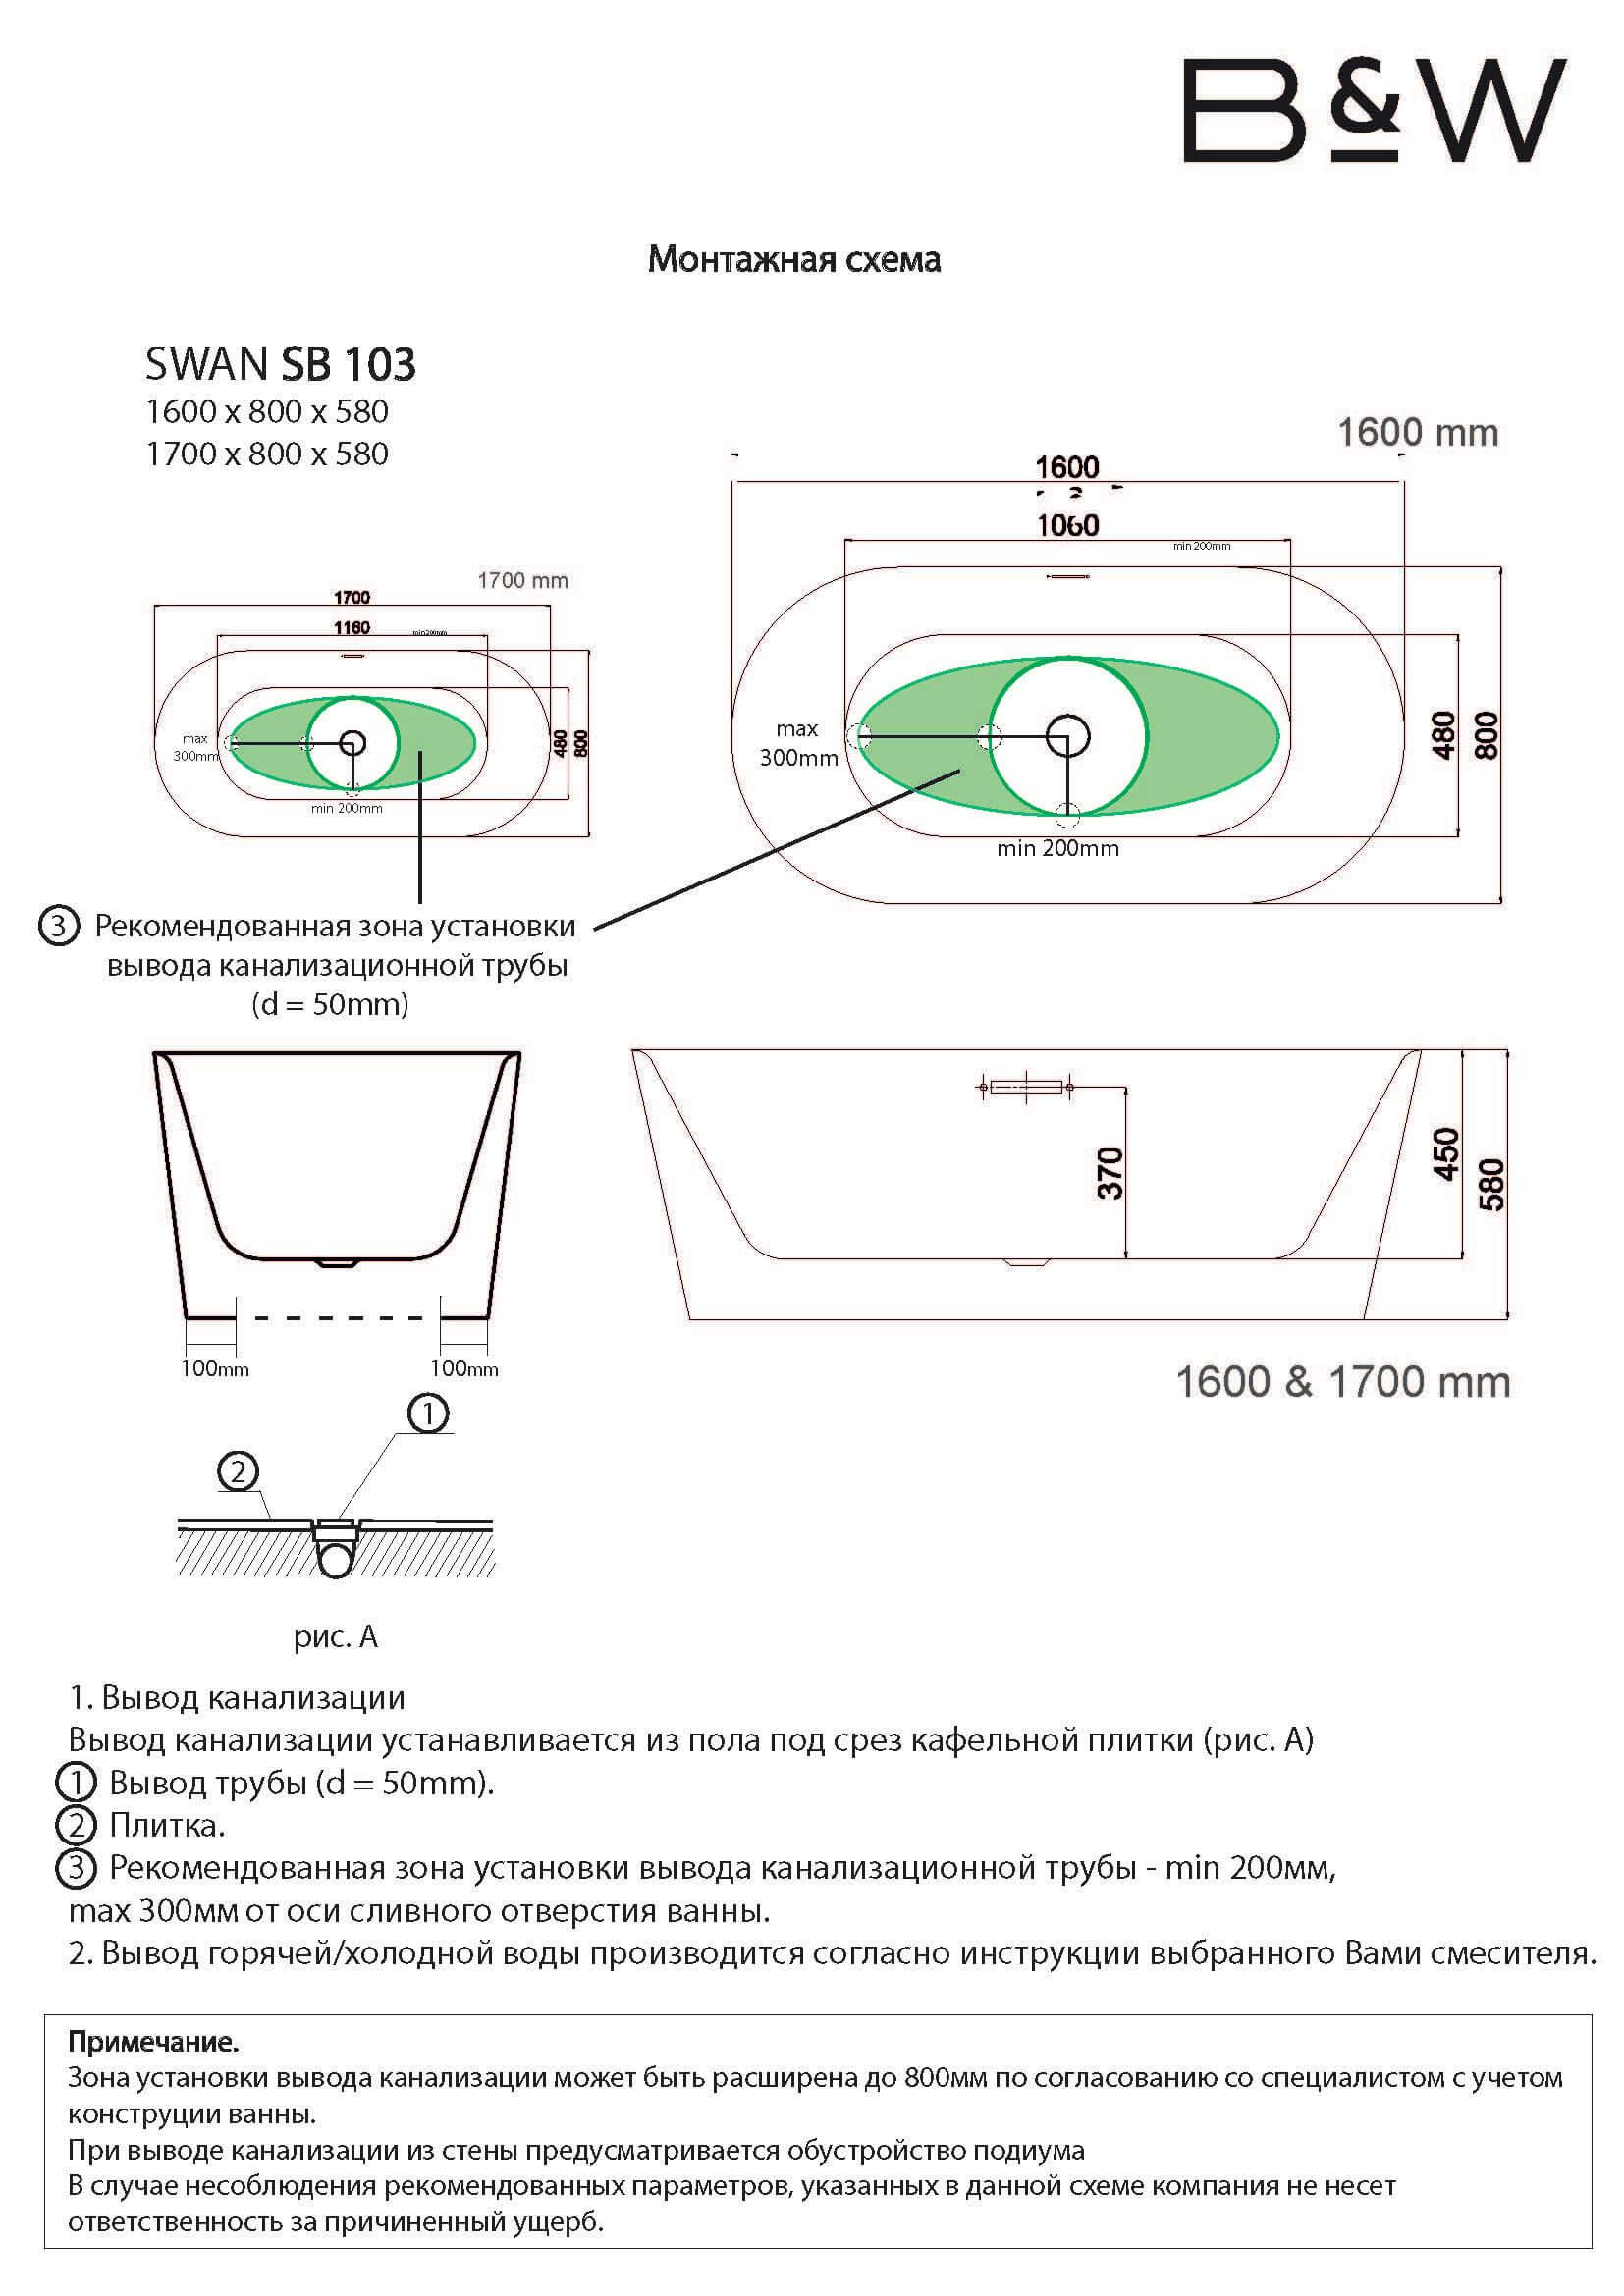 Монтажная схема ванны SB-103